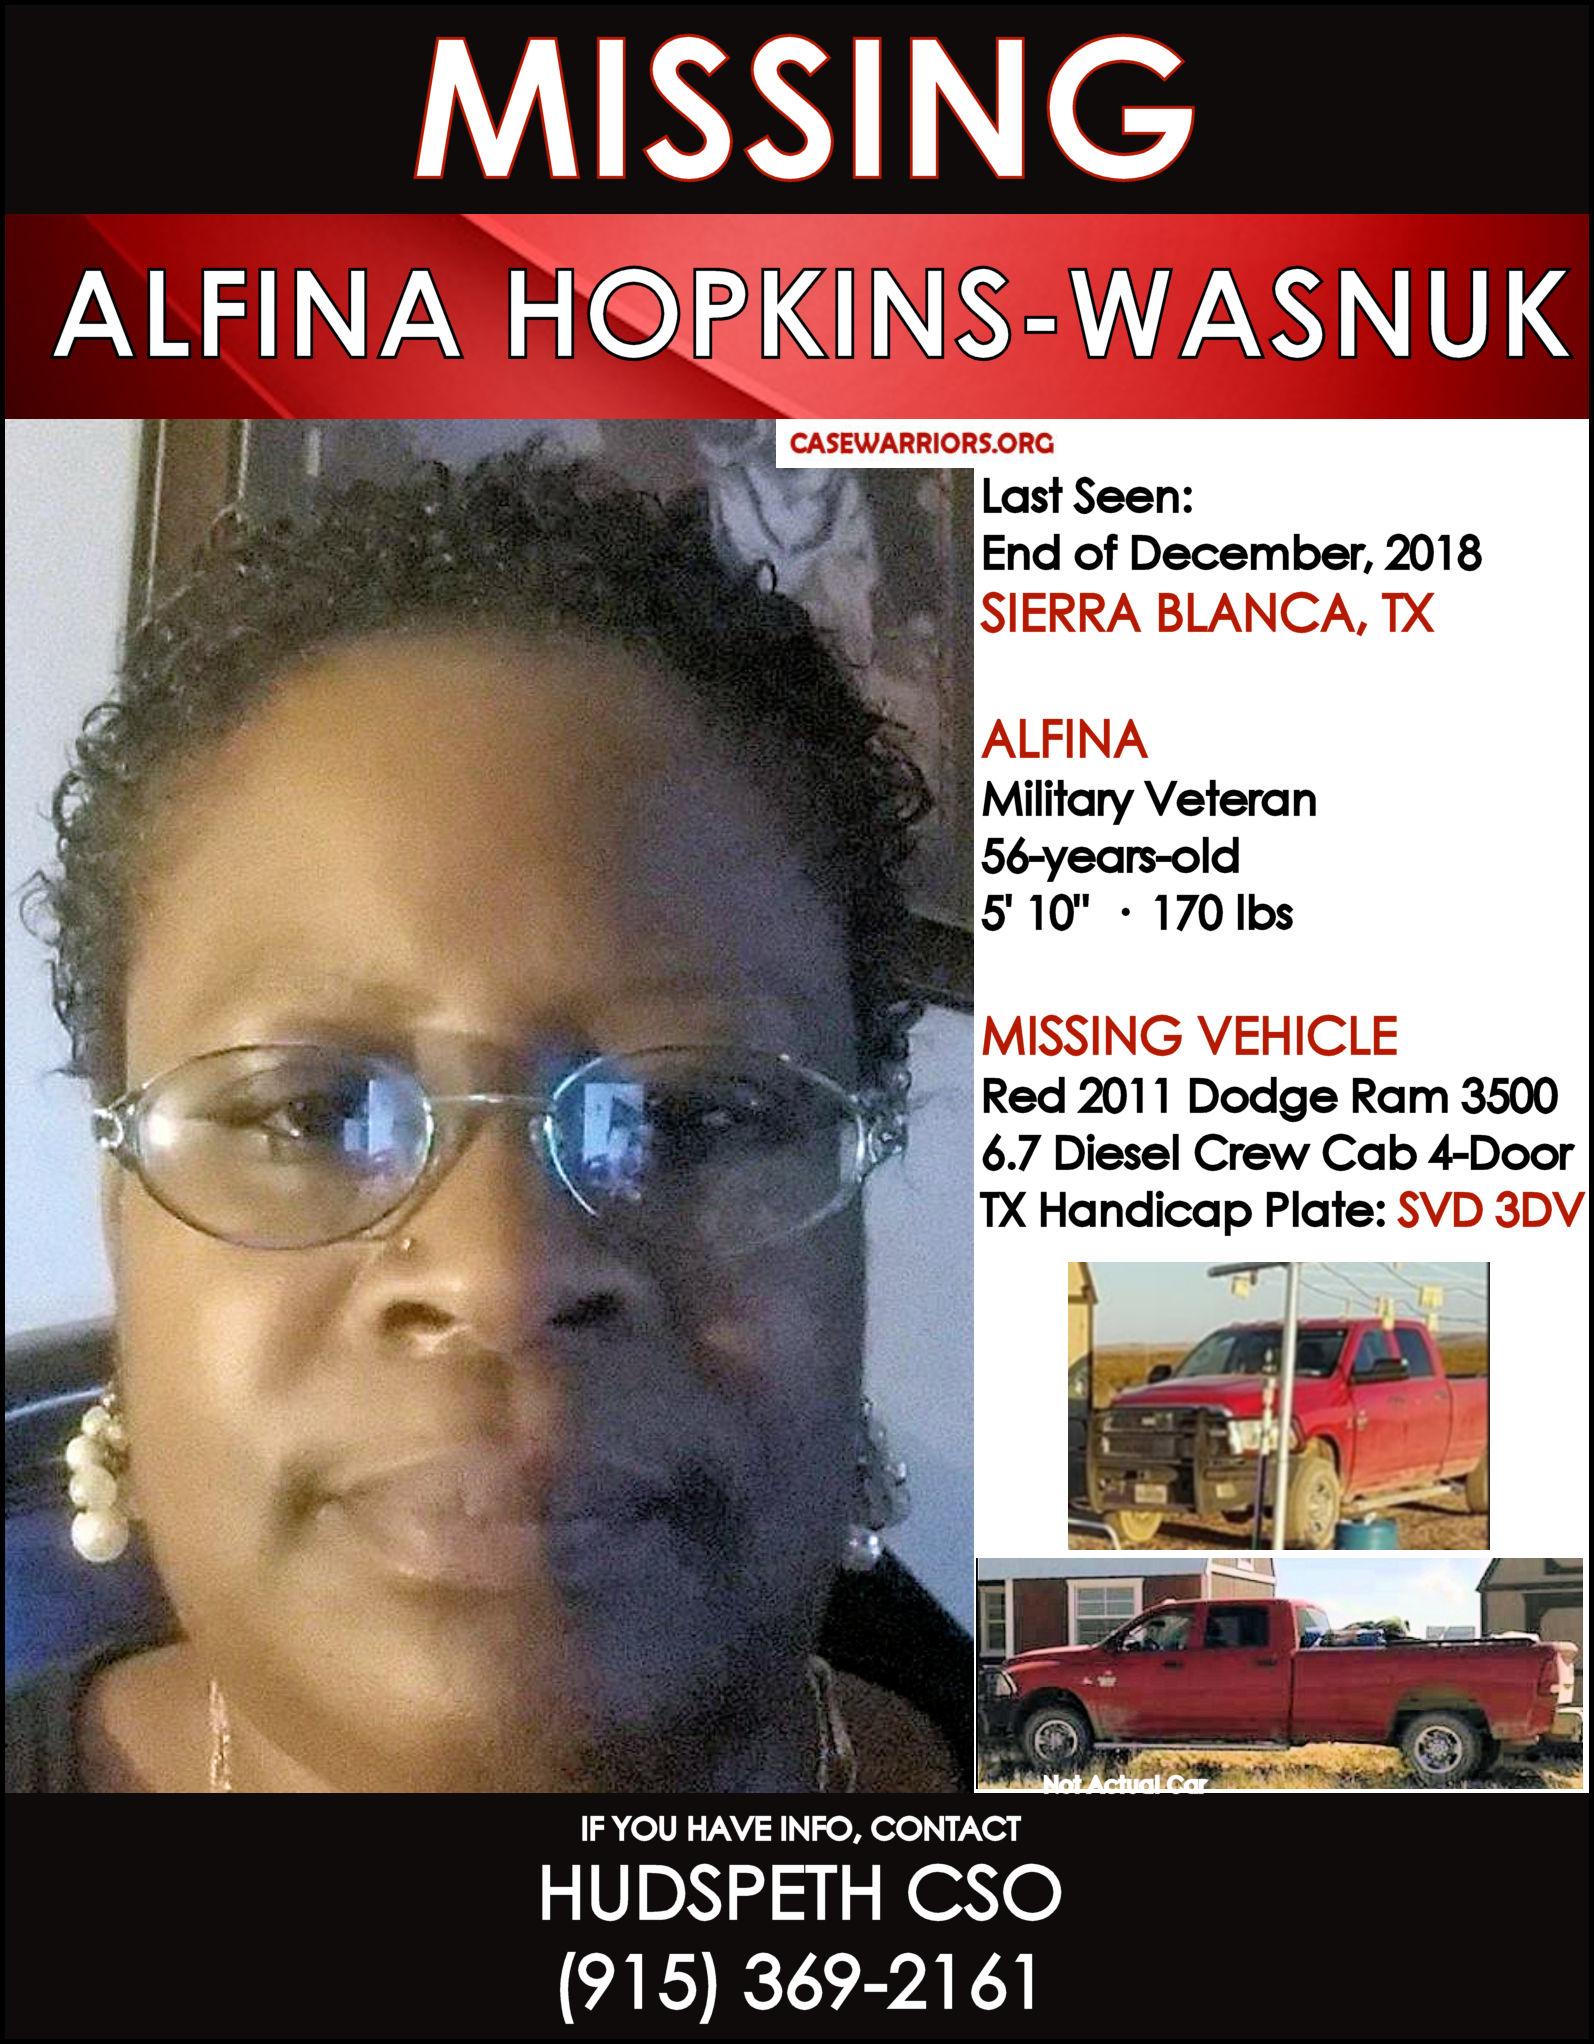 ALFINA HOPKINS-WASNUK